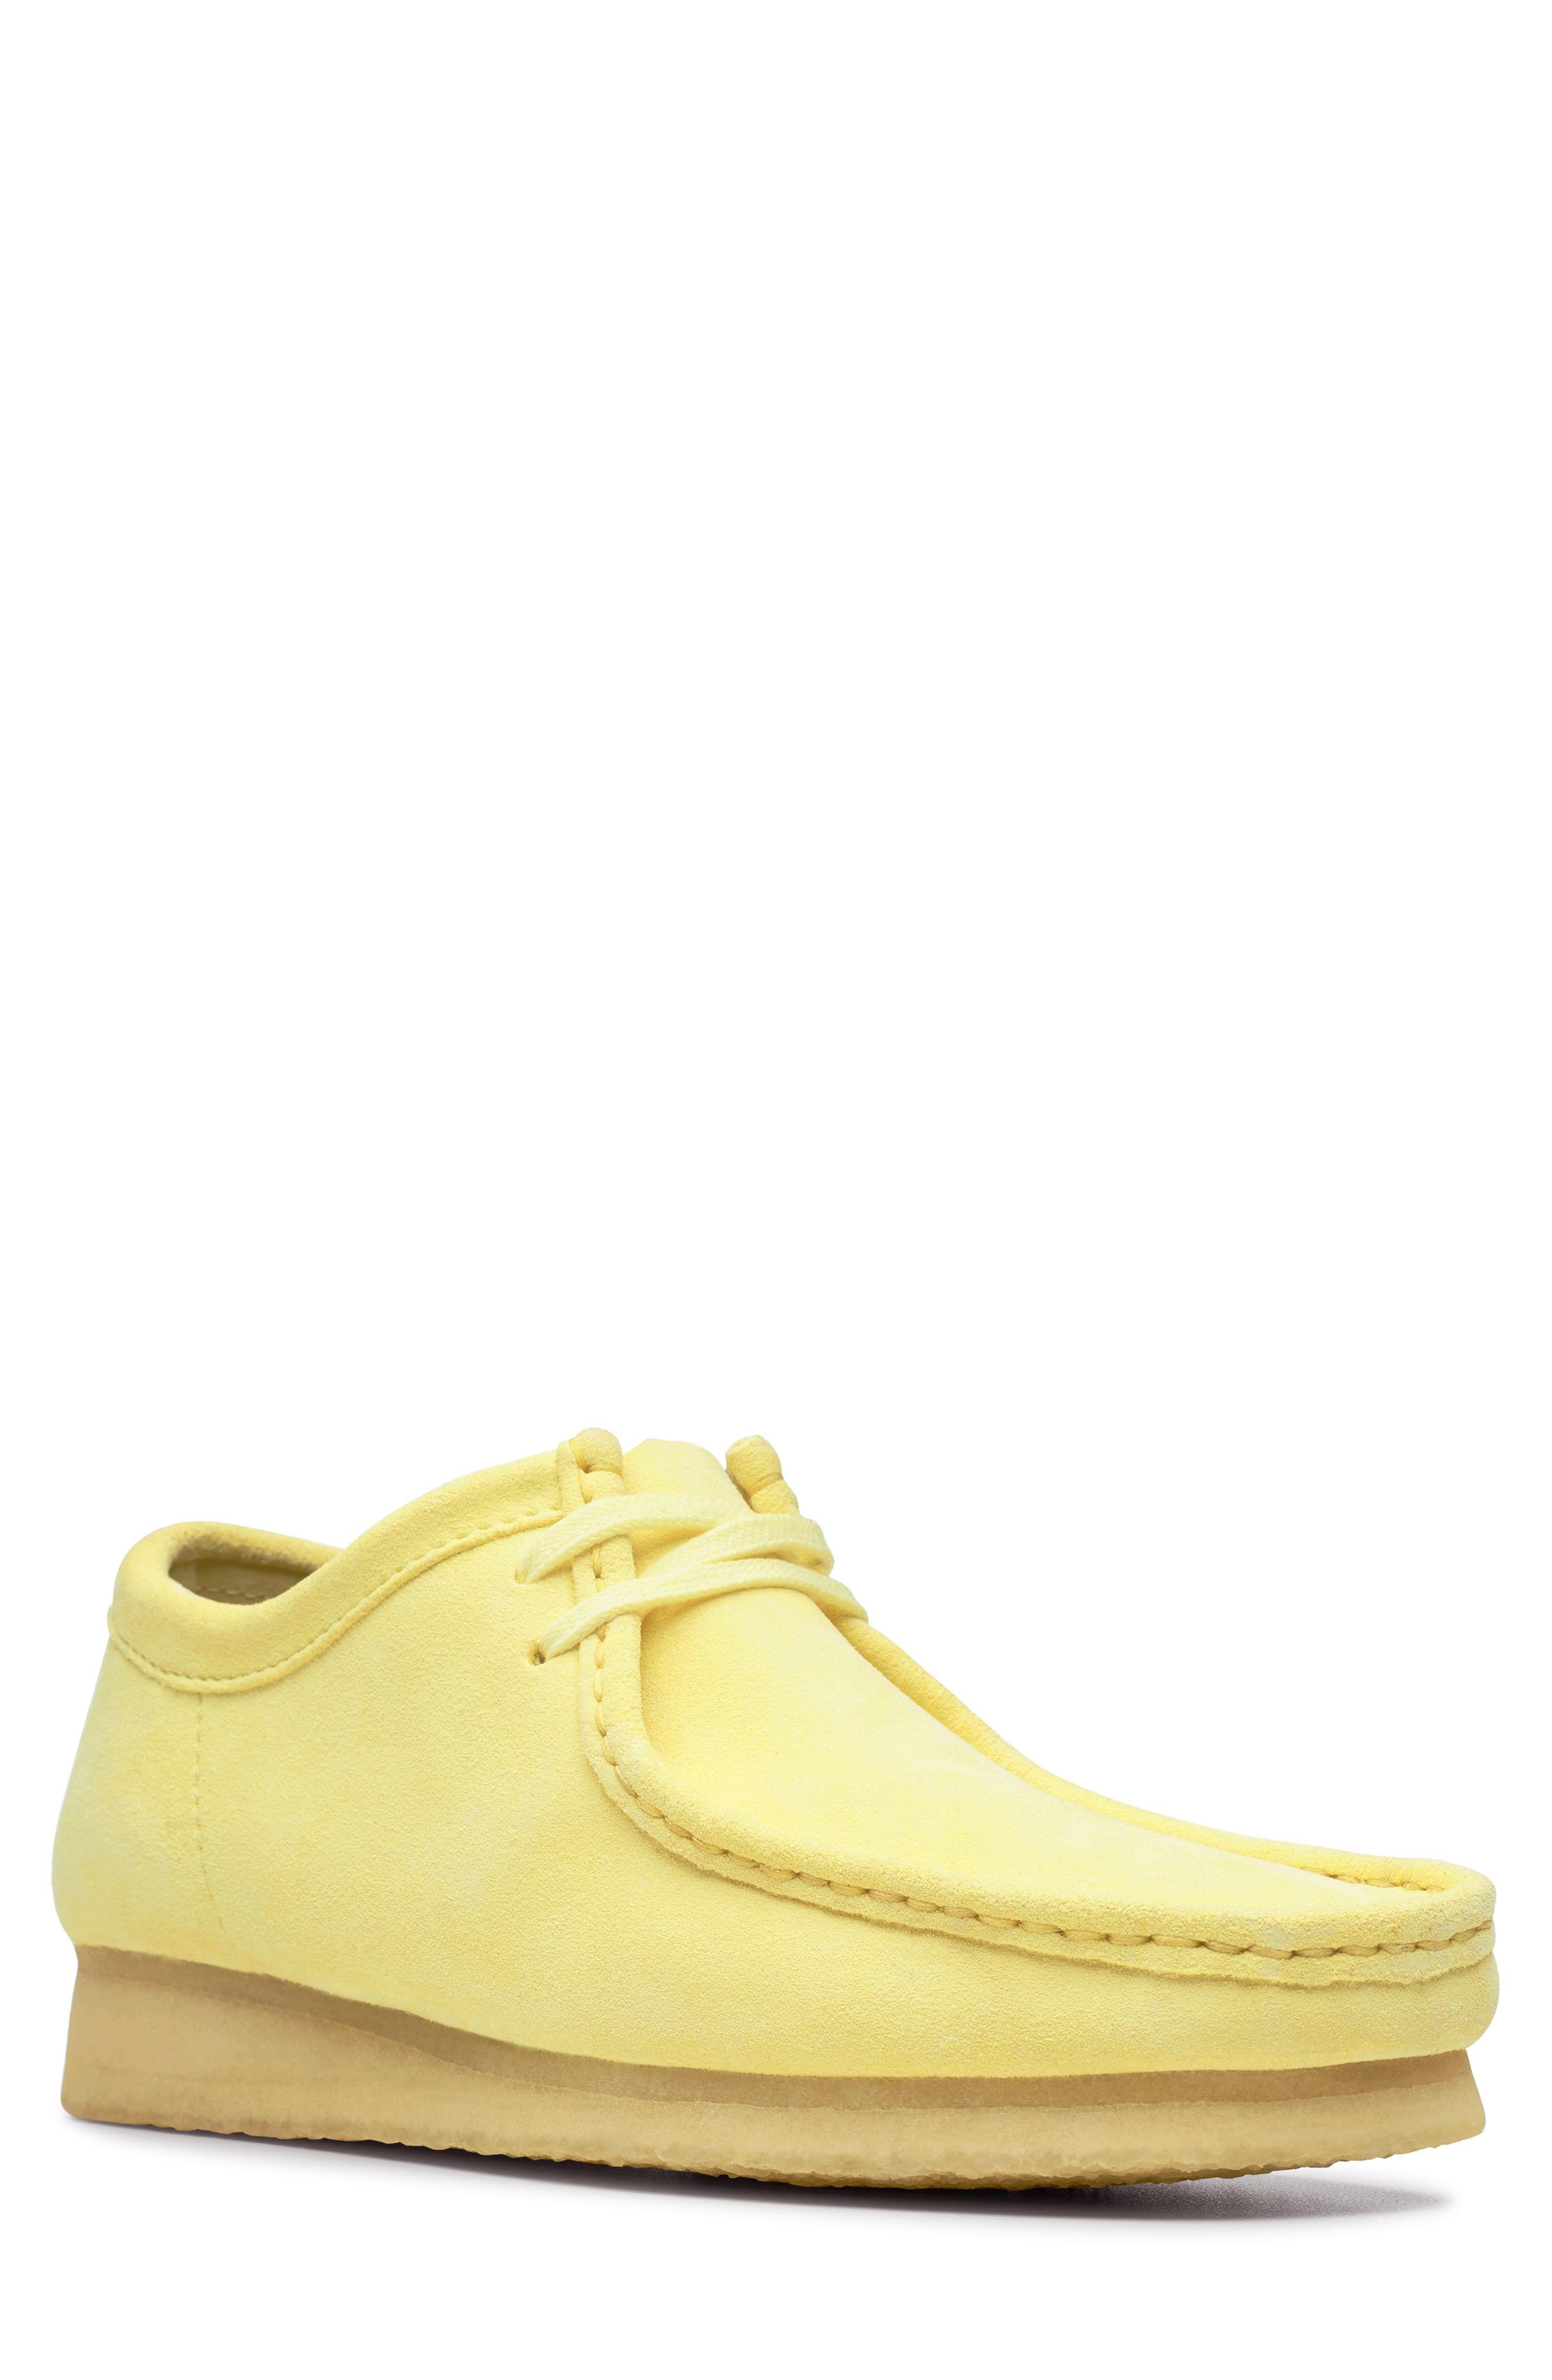 Men's Clarks Originals 'Wallabee' Moc Toe Derby, Size 10.5 M